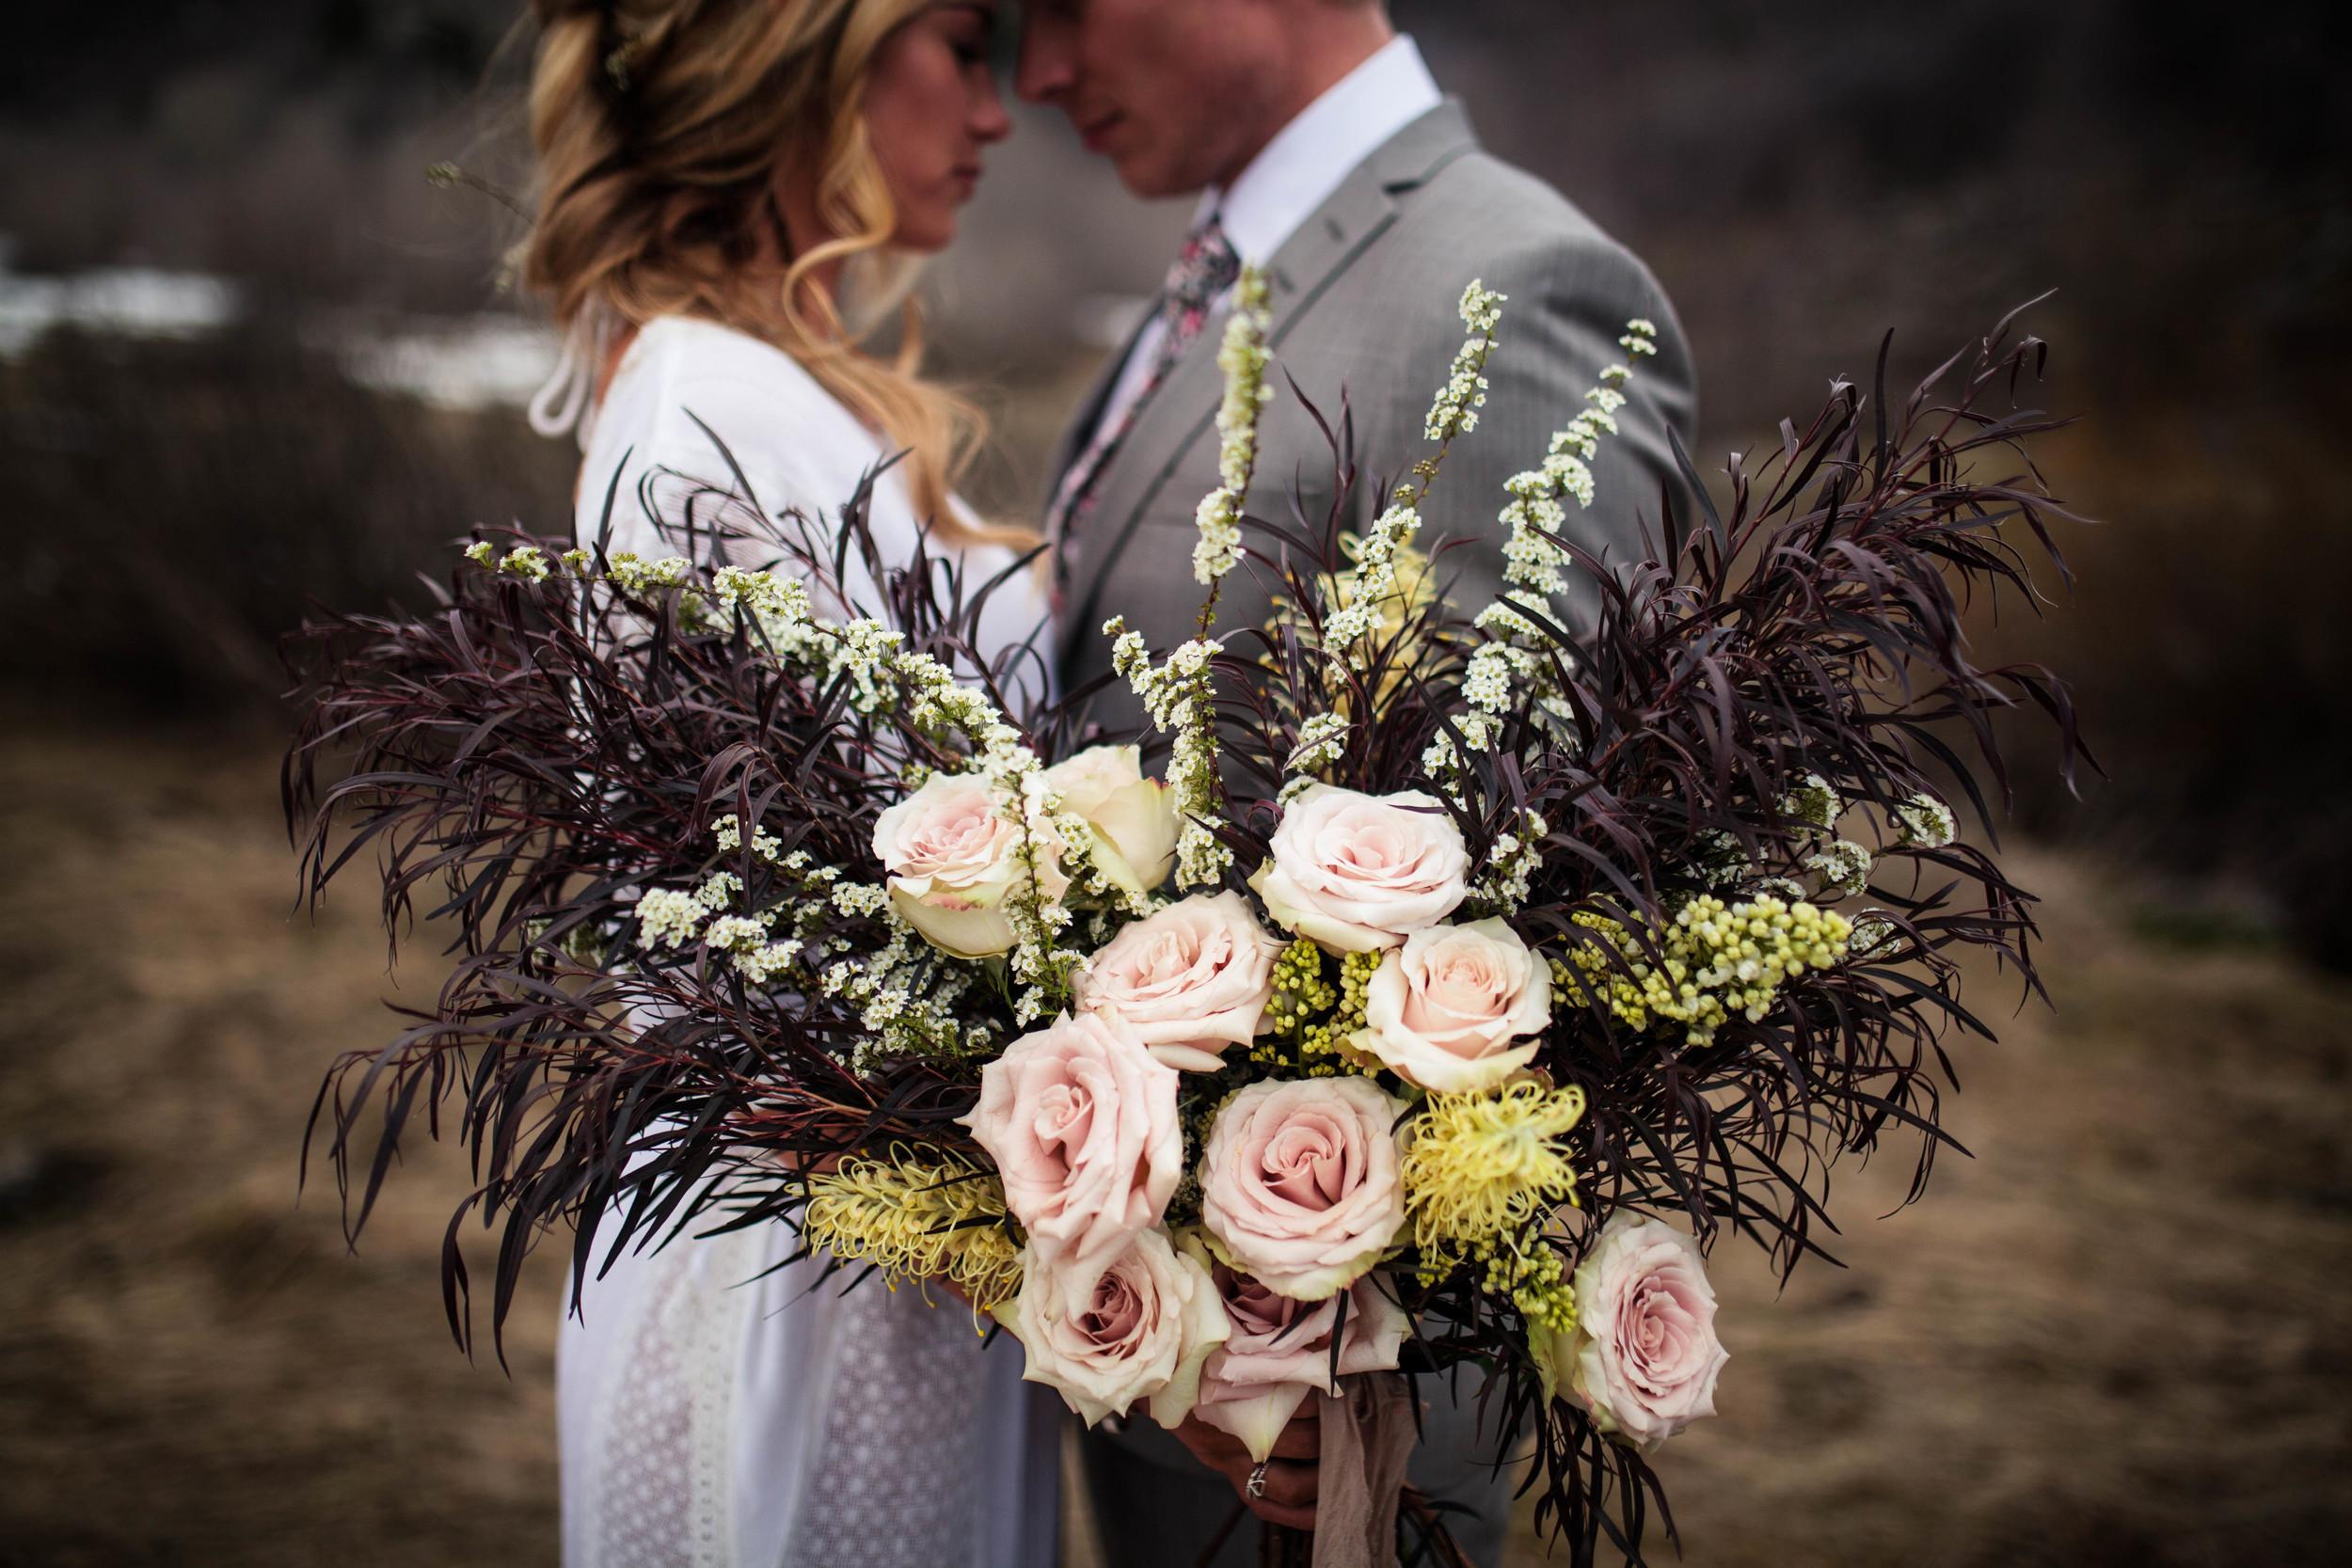 Candace & Thomas - Stylized Elopement - Whitney Justesen Photography-20.jpg